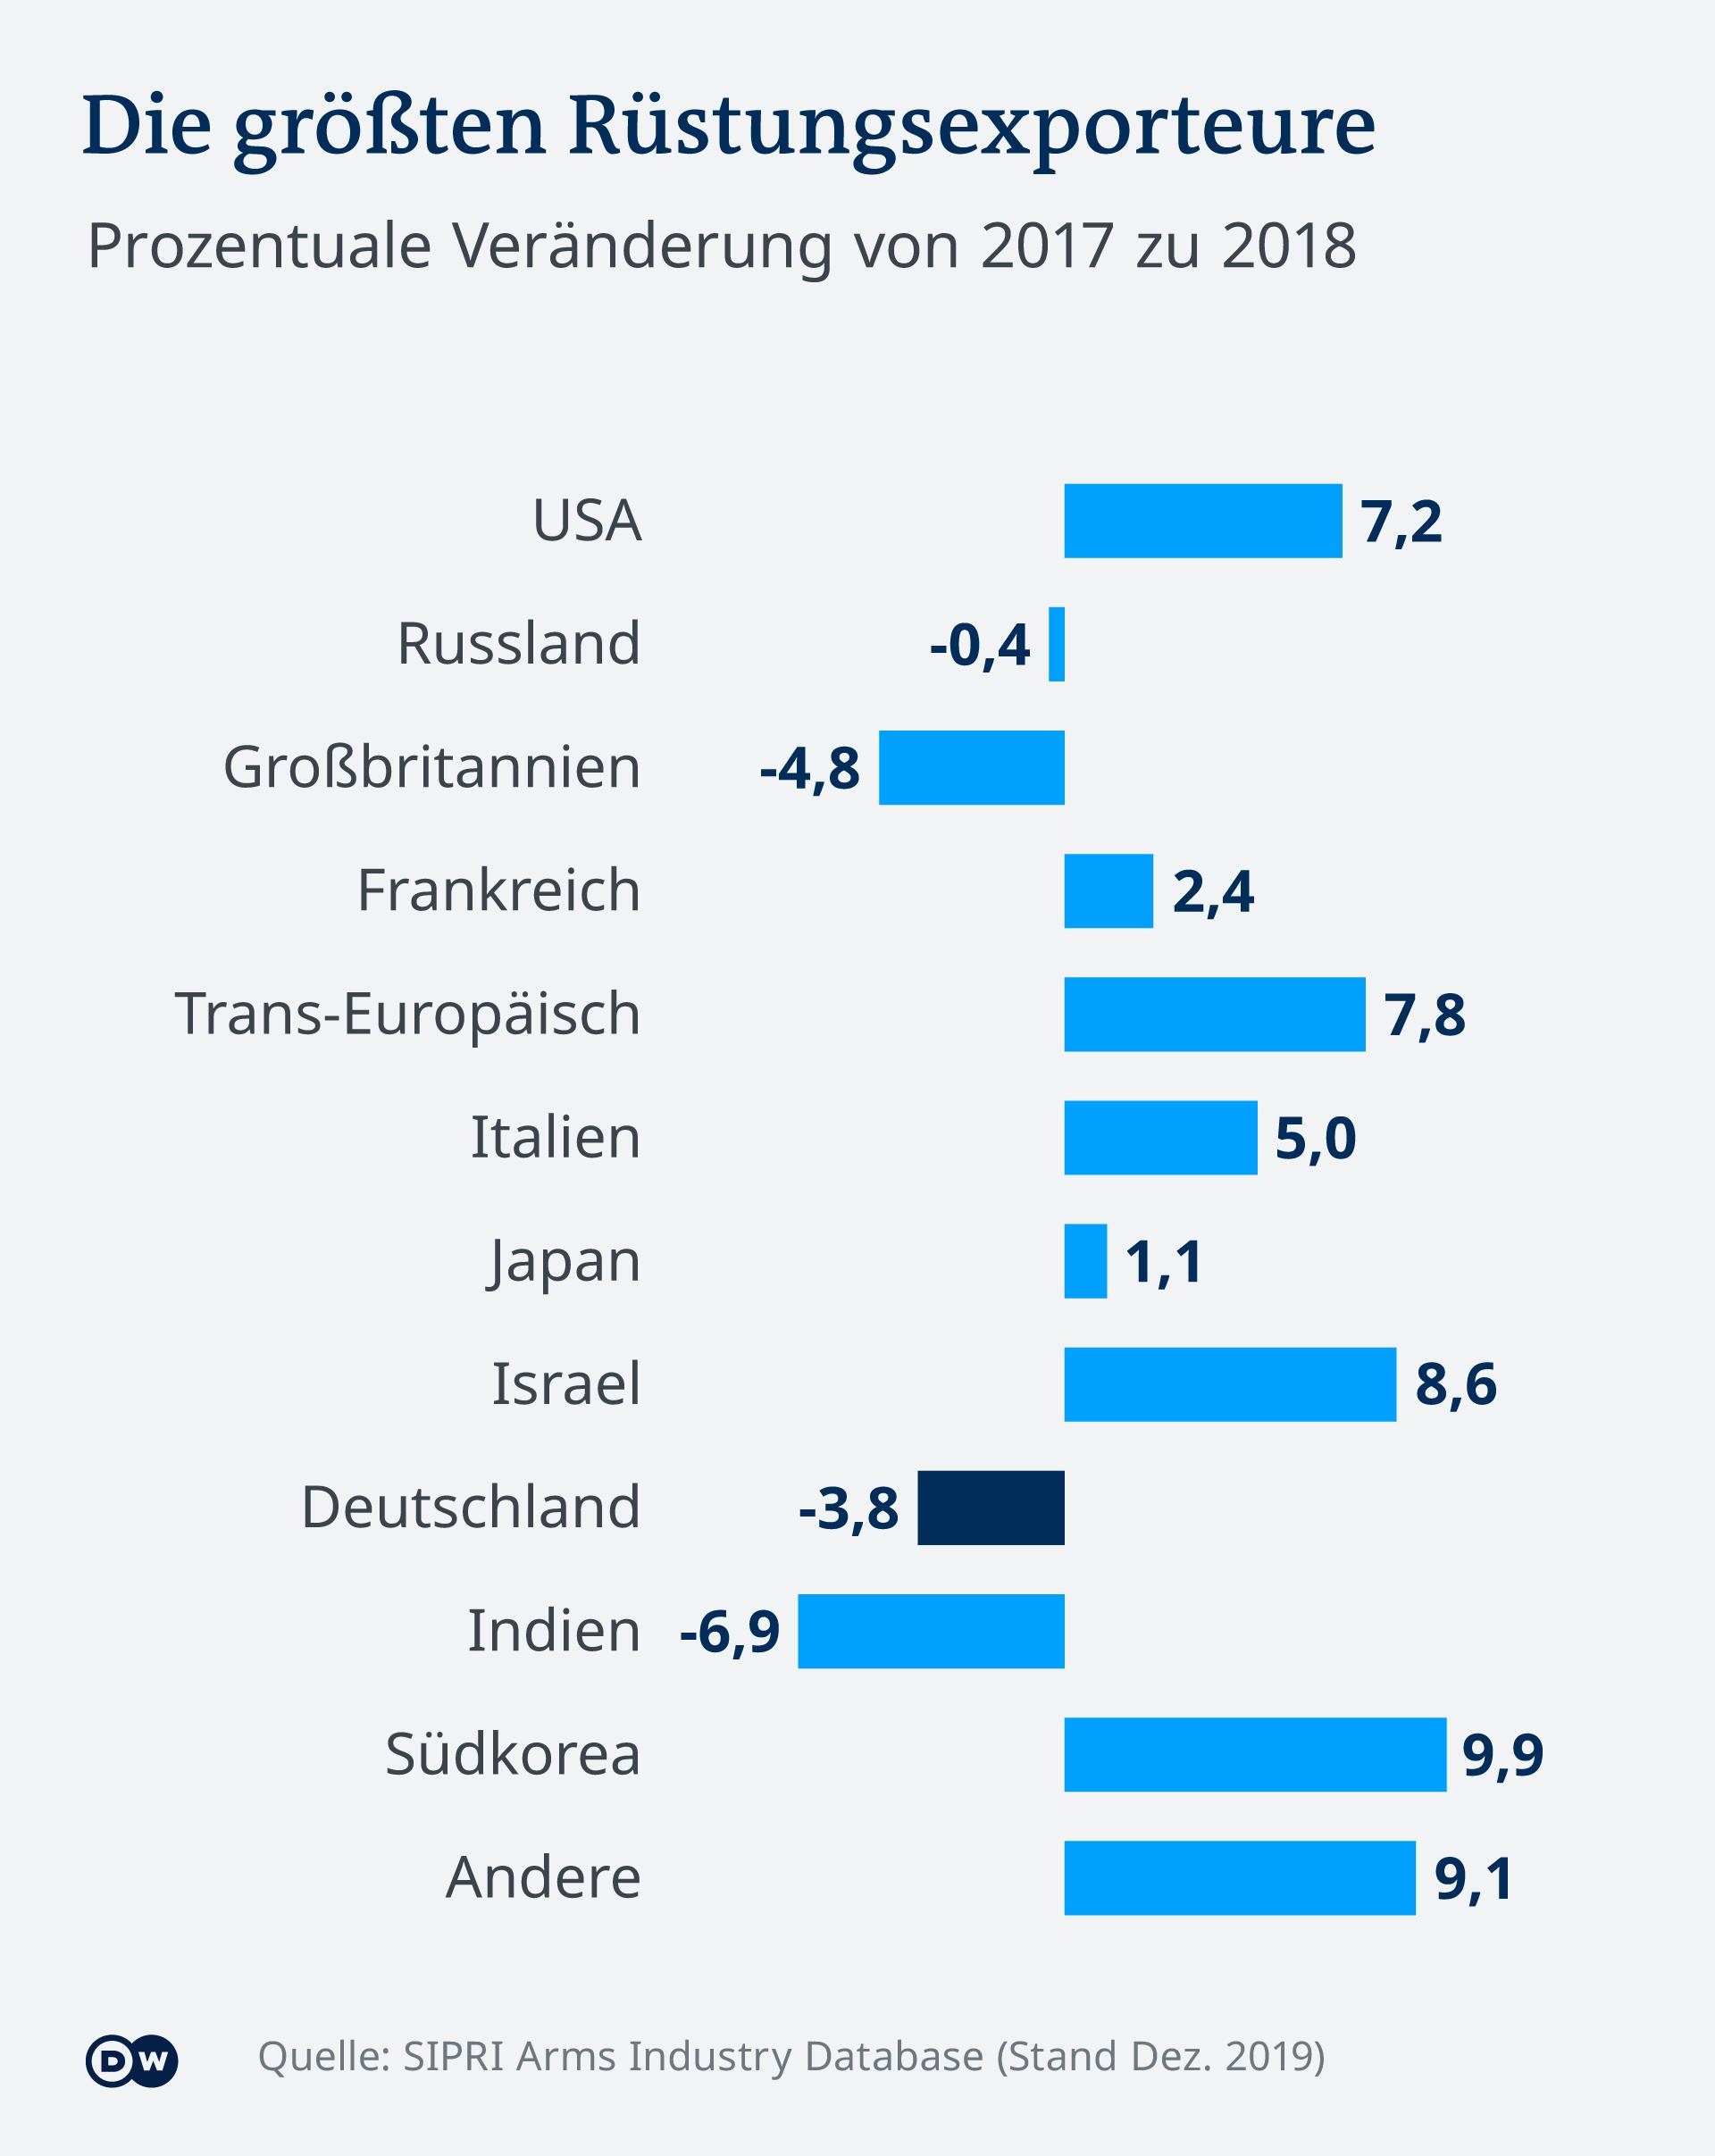 Infografik: Die größten Rüstungsexporteure 2018 (DW-Grafik/SIPRI)